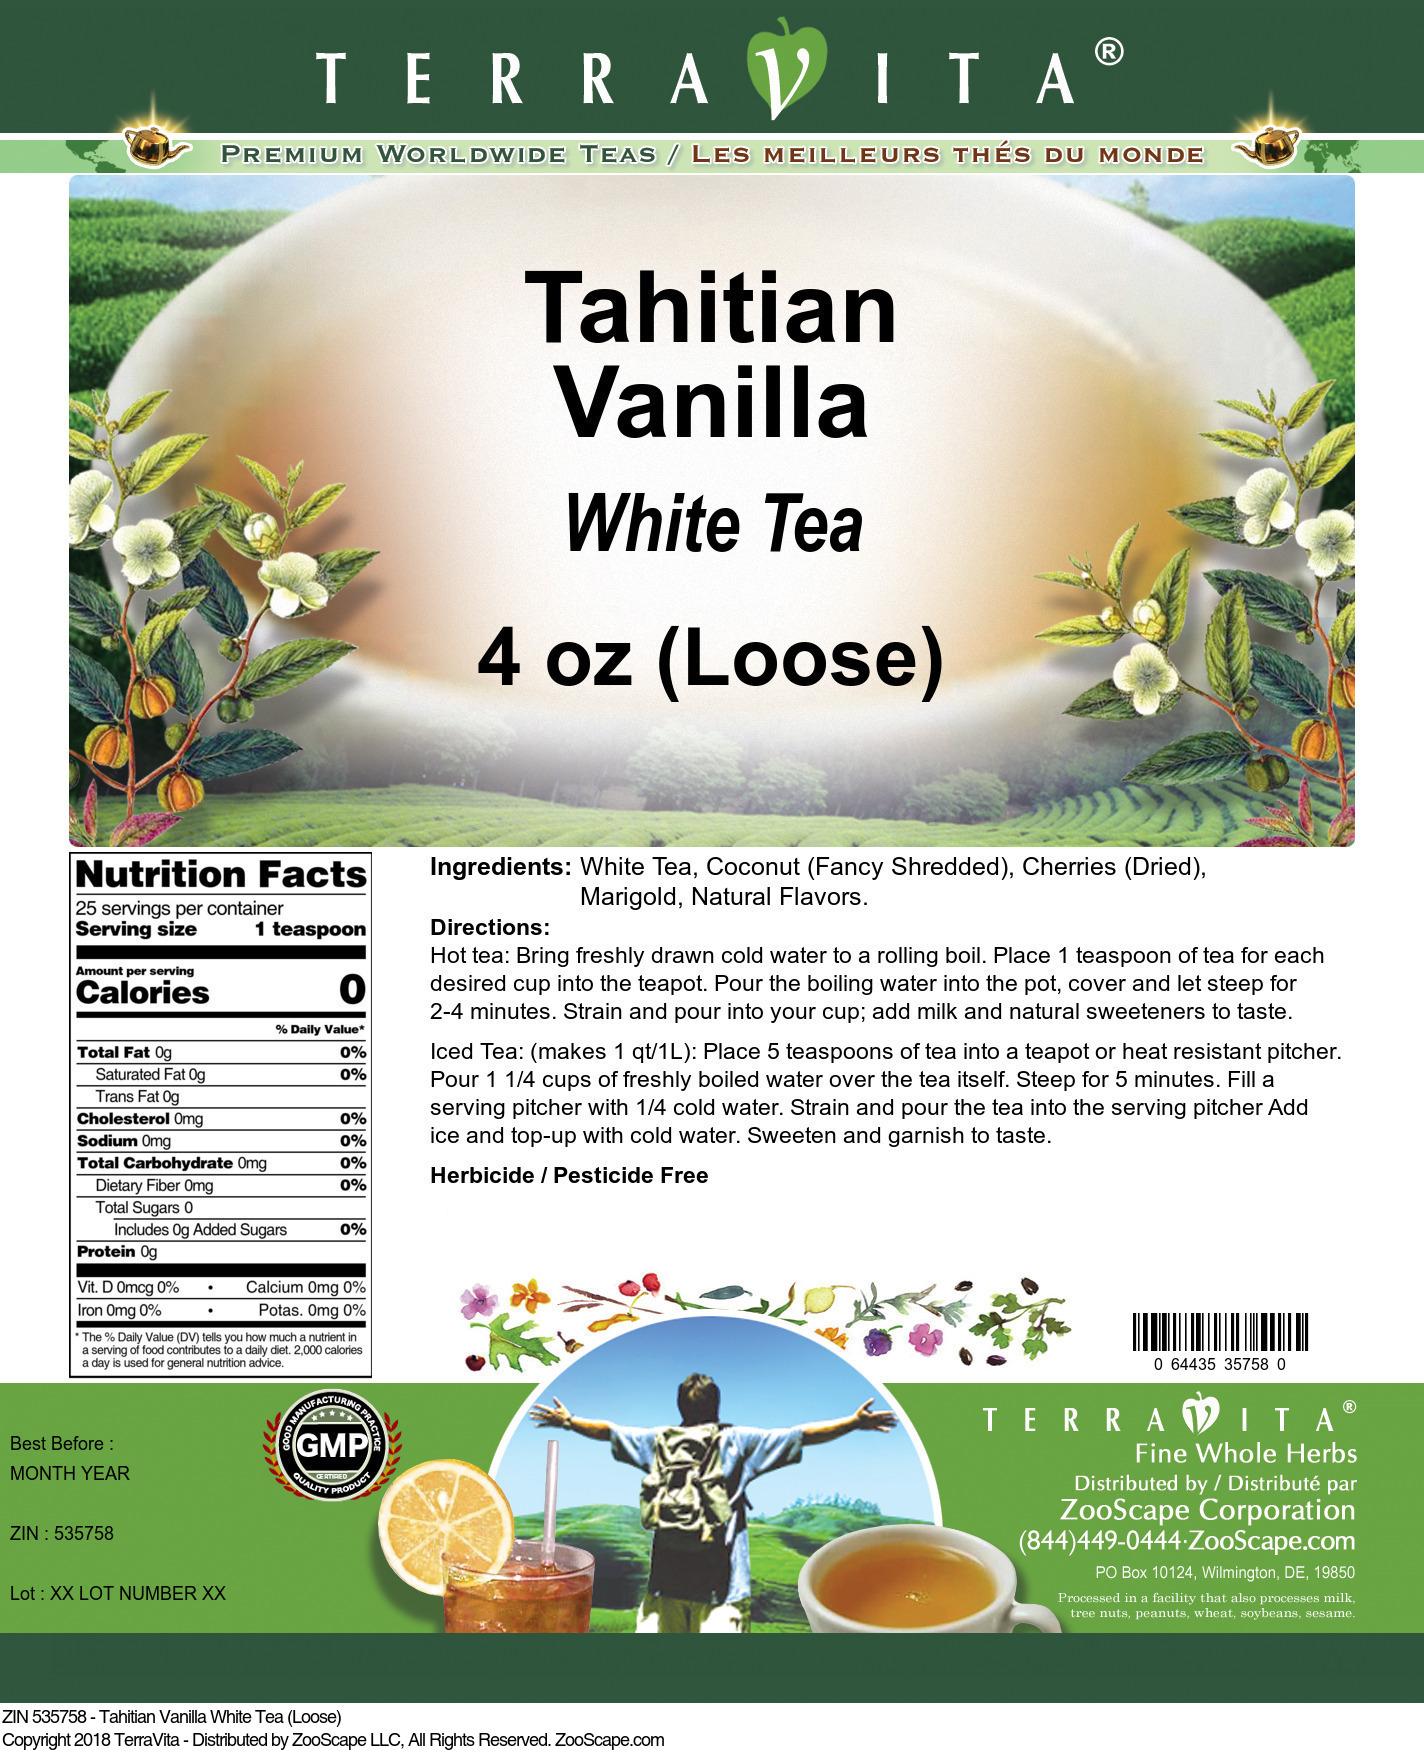 Tahitian Vanilla White Tea (Loose)